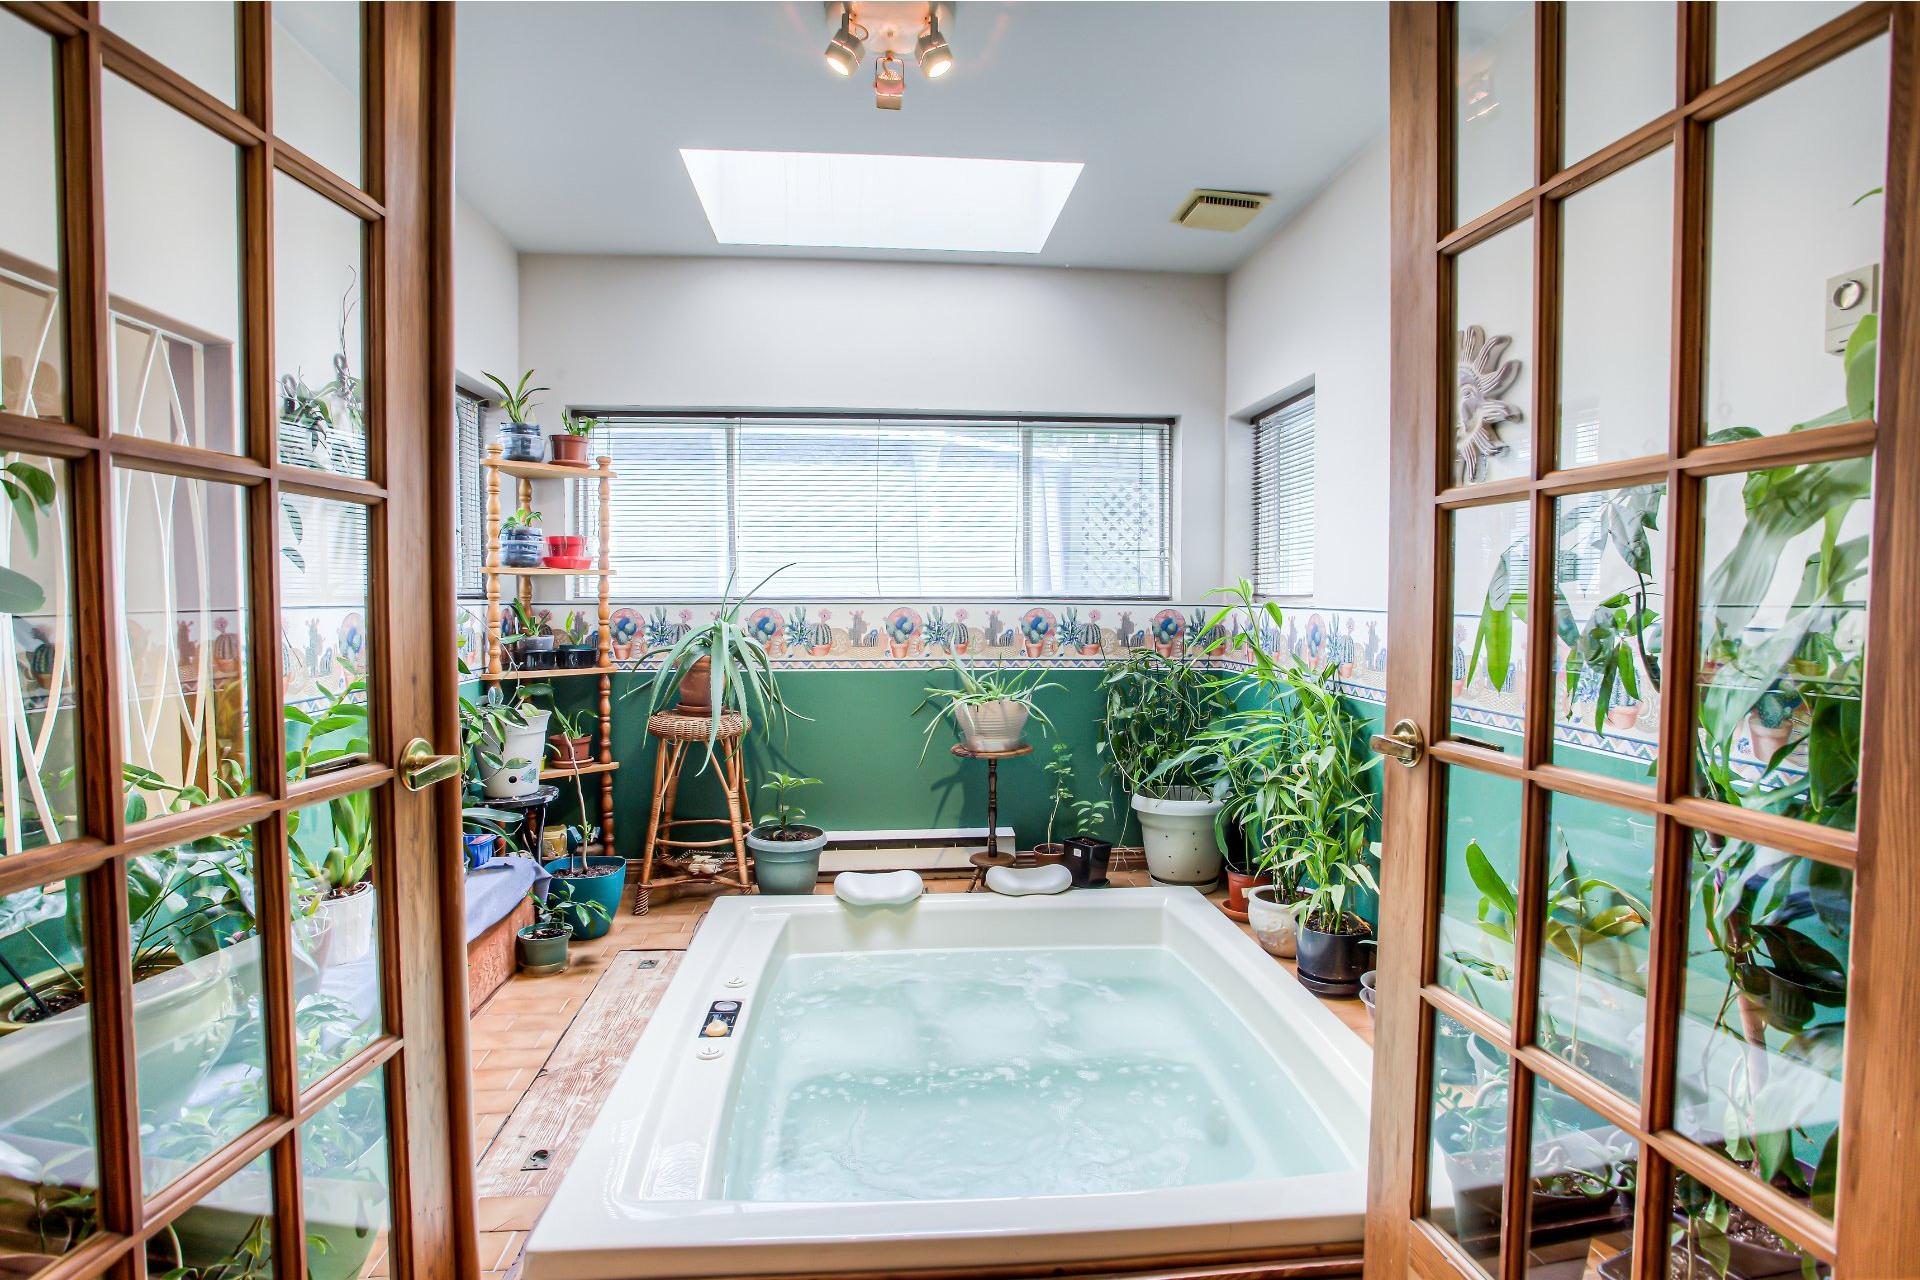 image 14 - MX - Casa sola - MX En venta Dollard-Des Ormeaux - 11 habitaciones